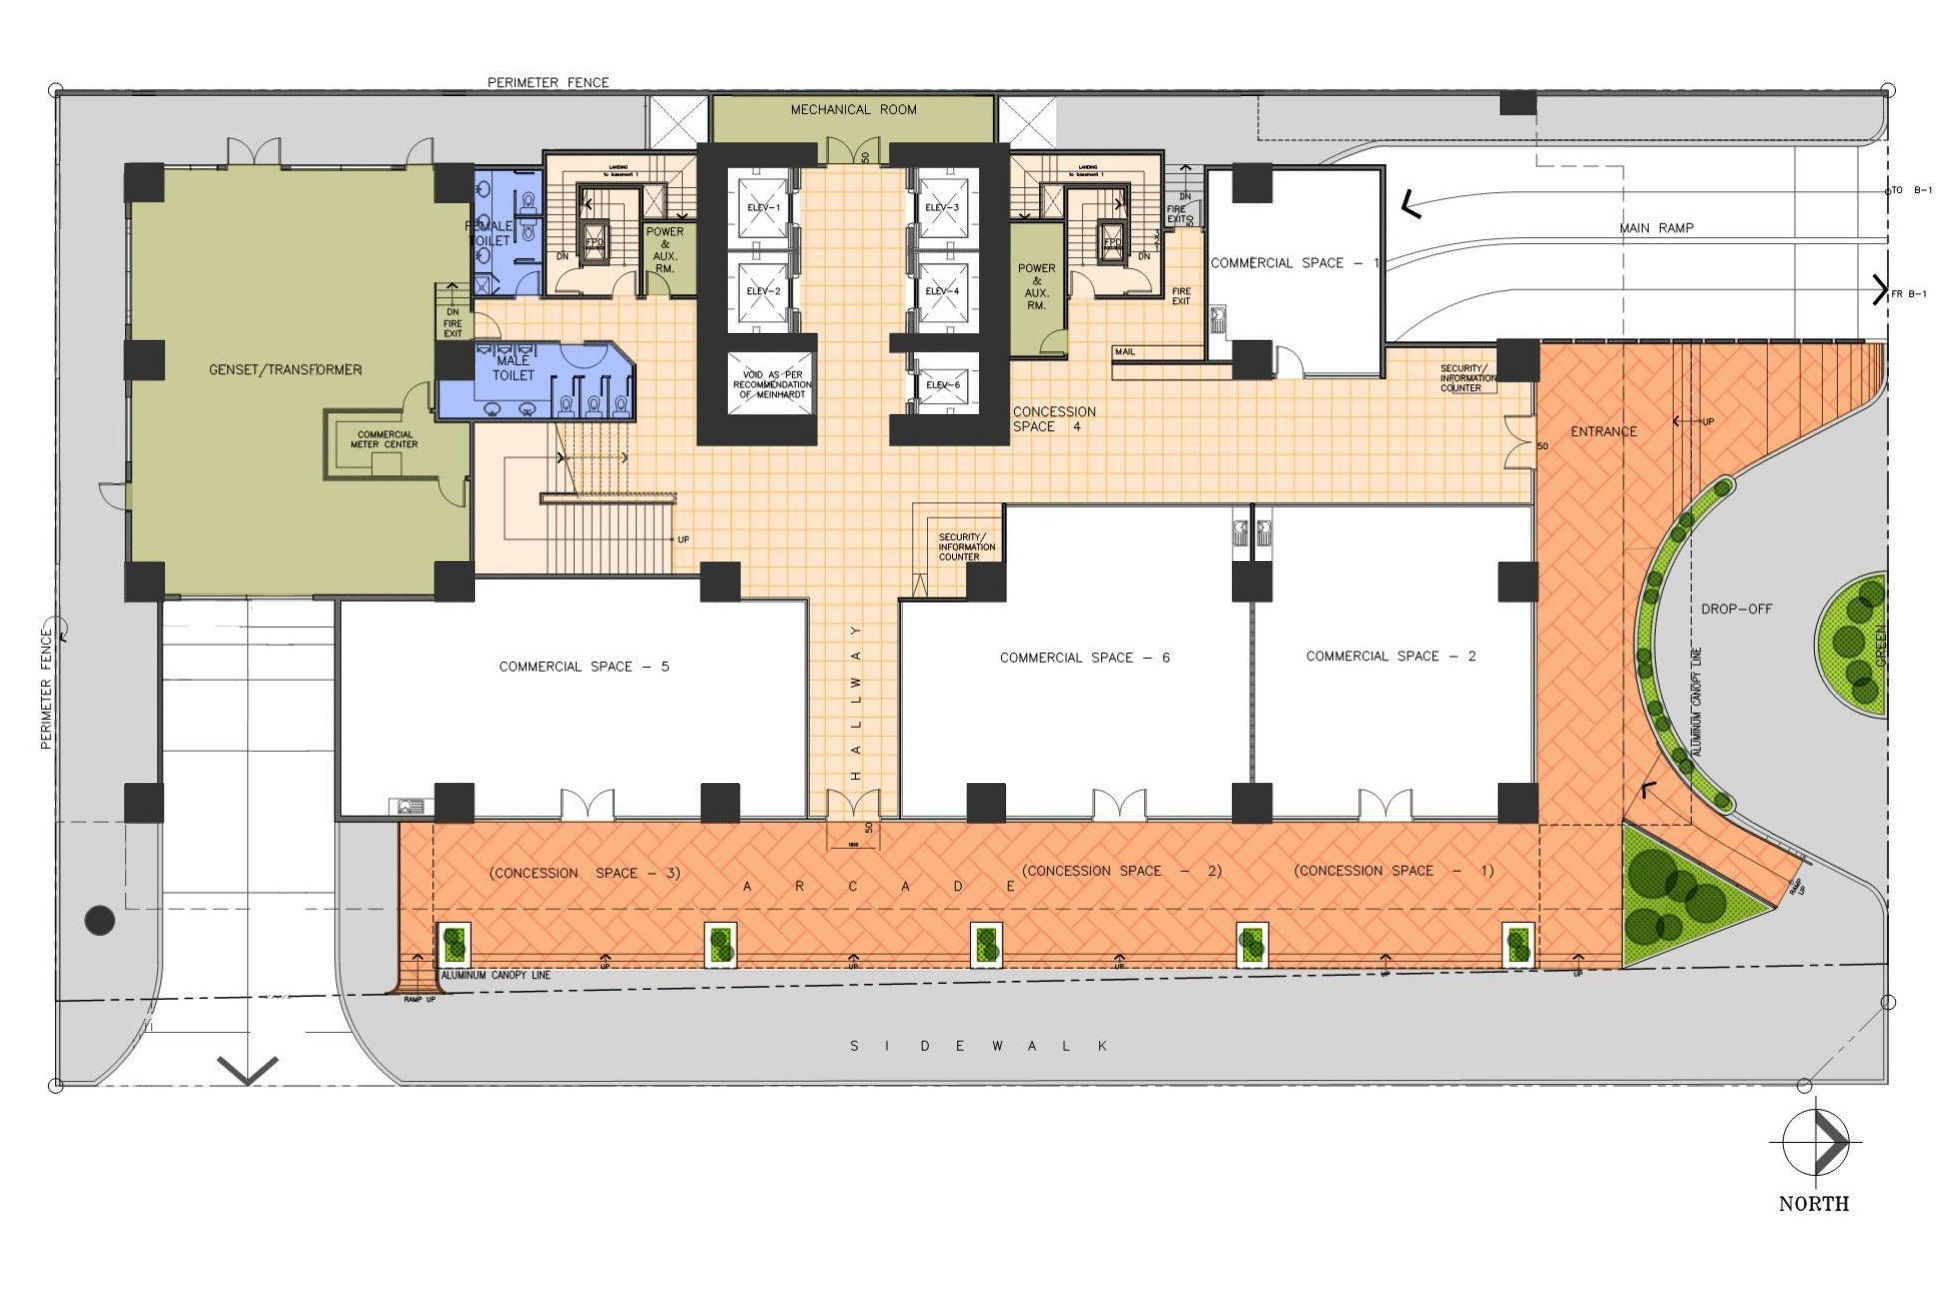 AMA Tower Residences - Ground Floor